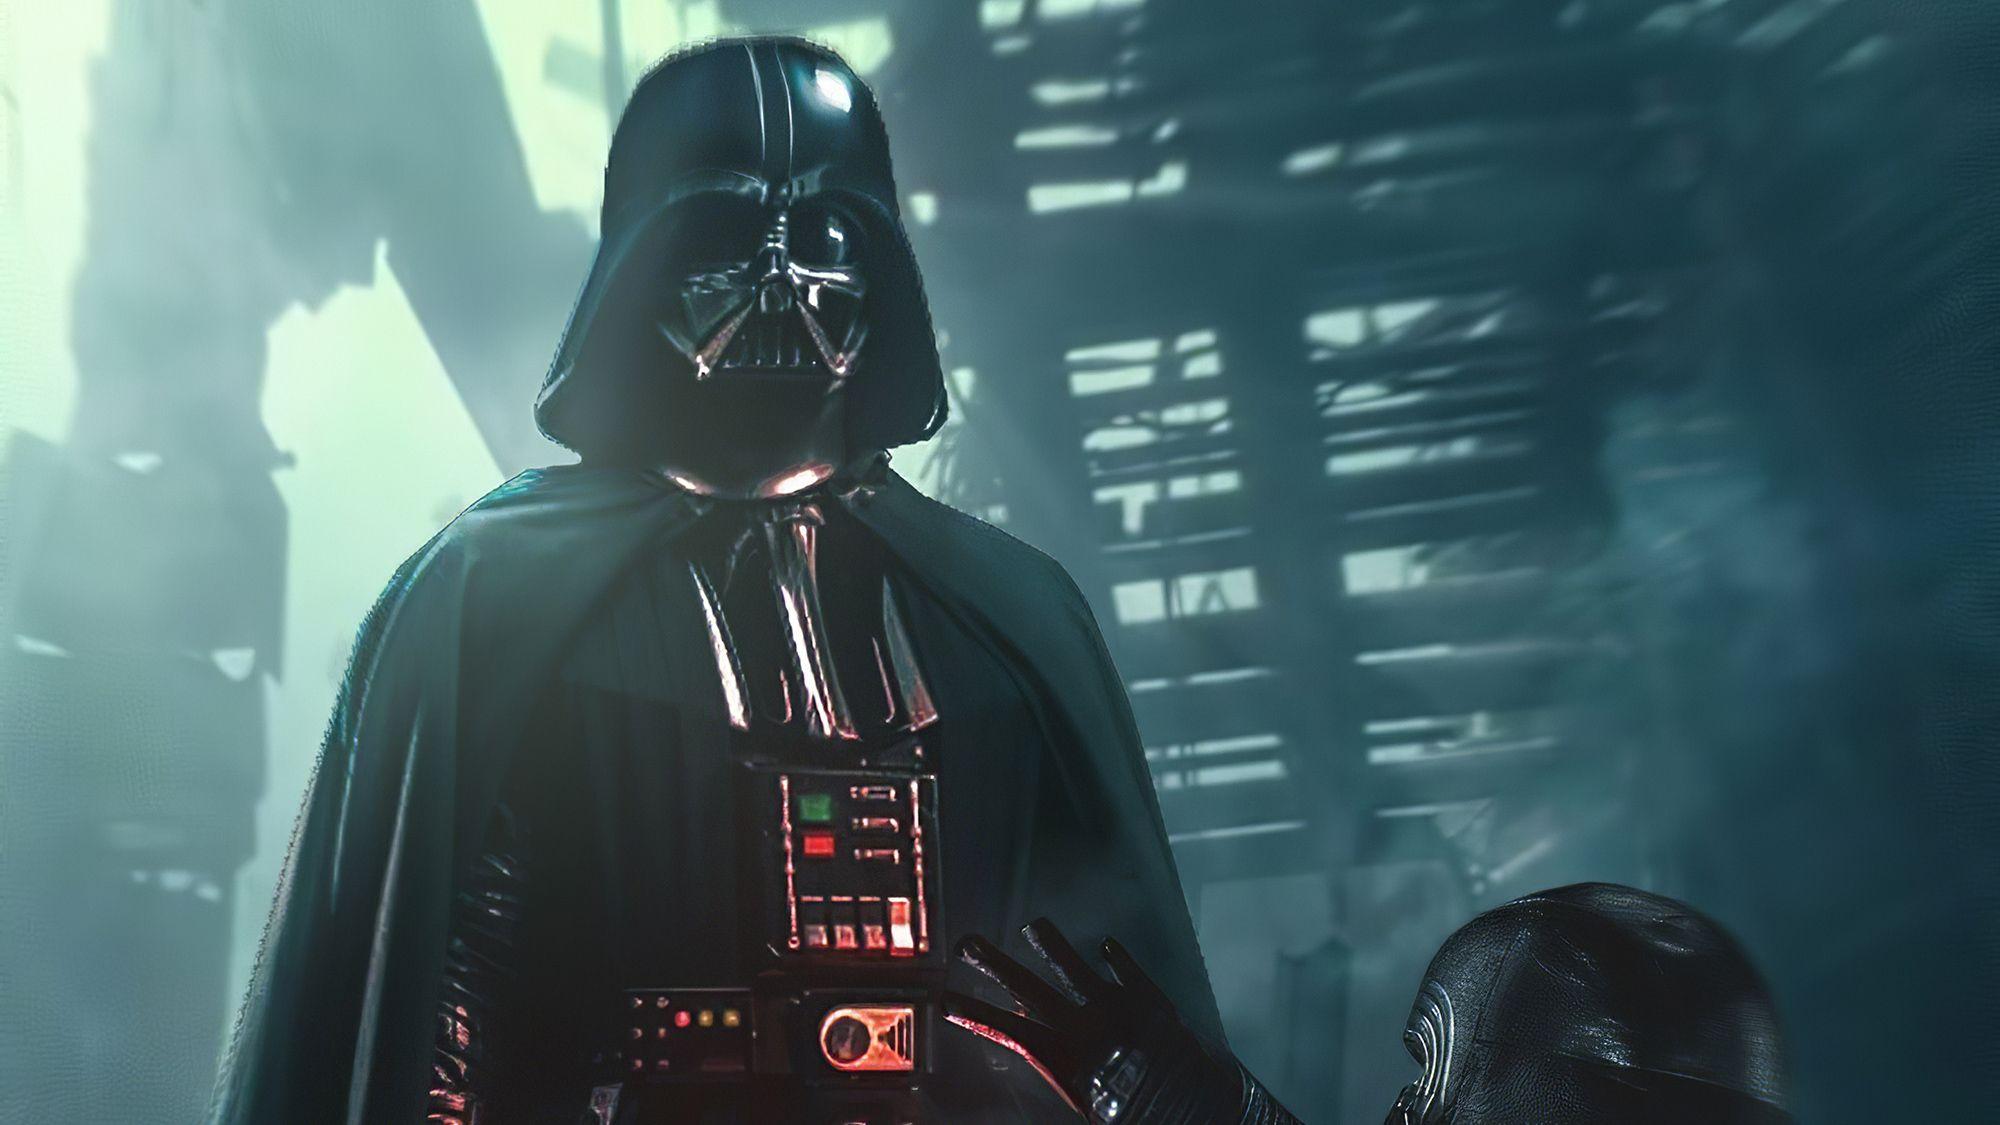 Darth Vader Helmet Desktop Wallpapers - Wallpaper Cave